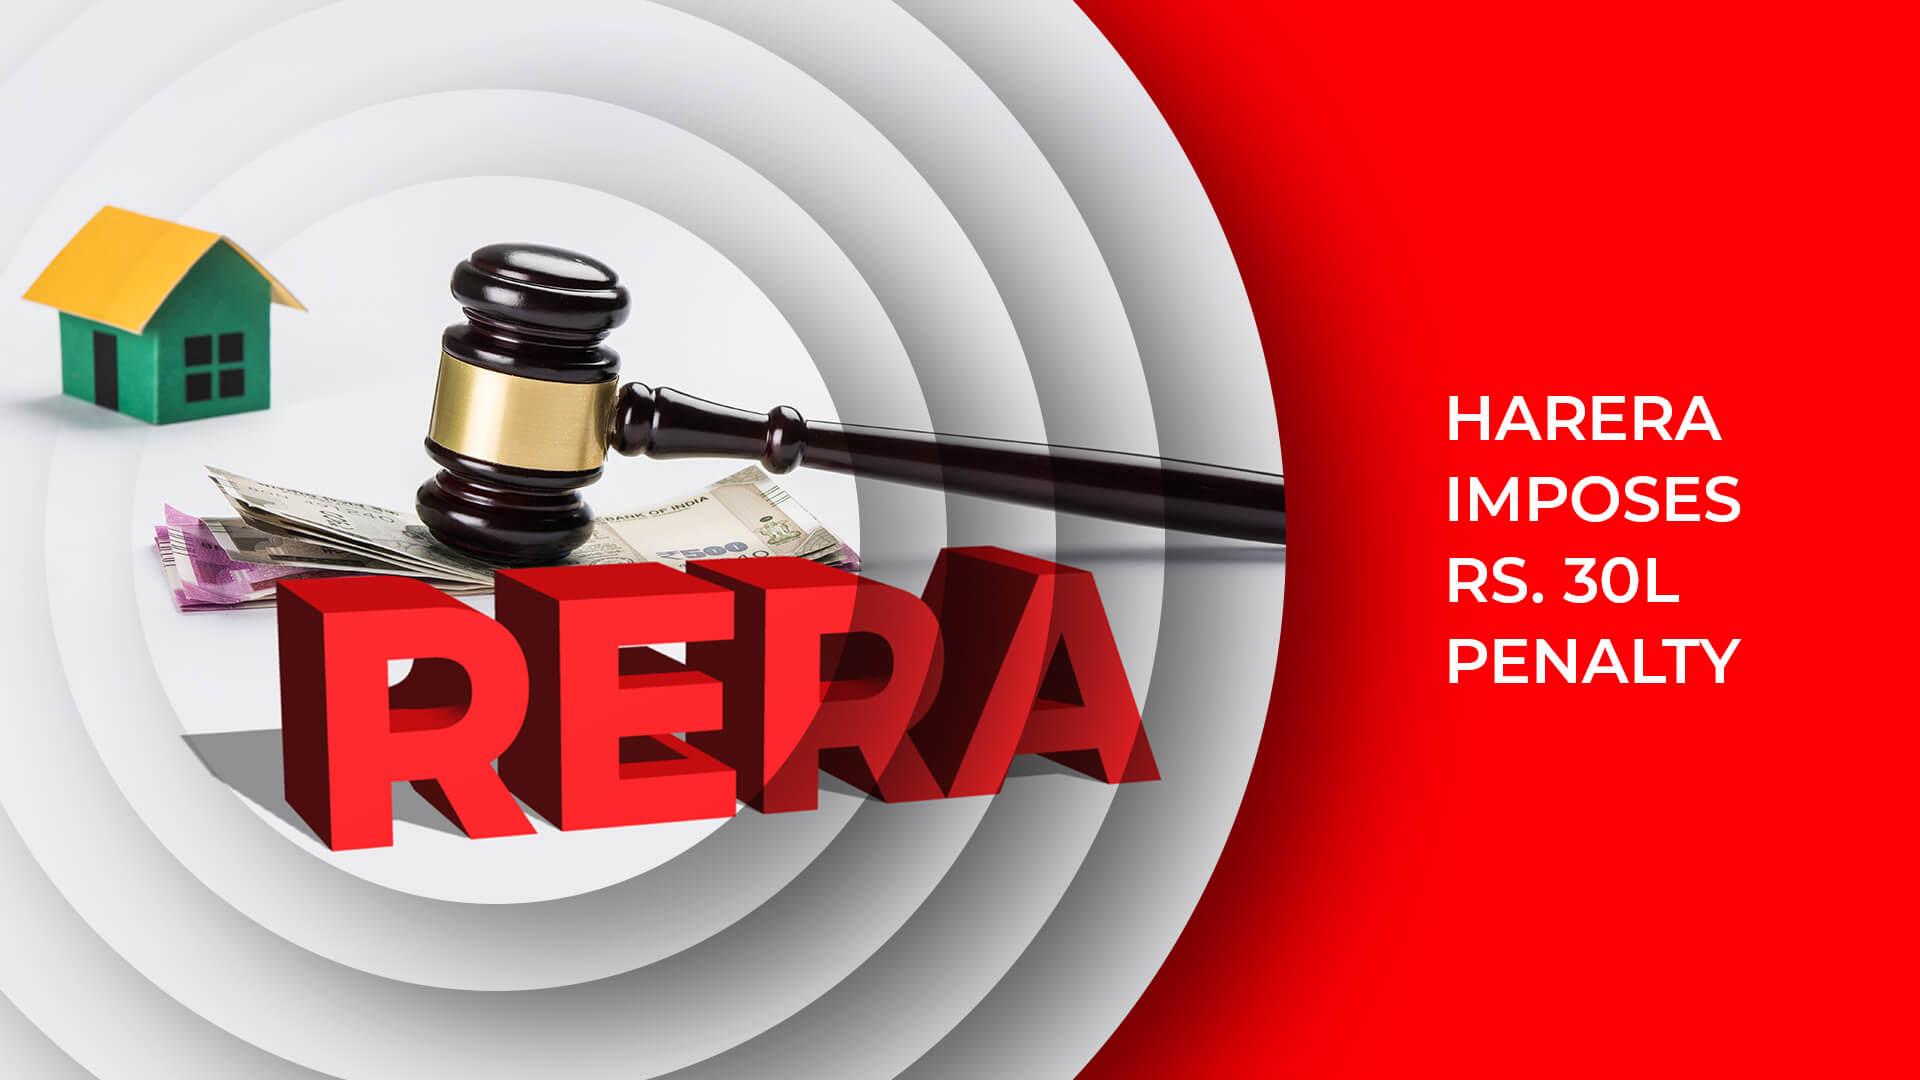 Haryana RERA Imposes 30 Lakh Fine On Indo-Japanese Joint Venture